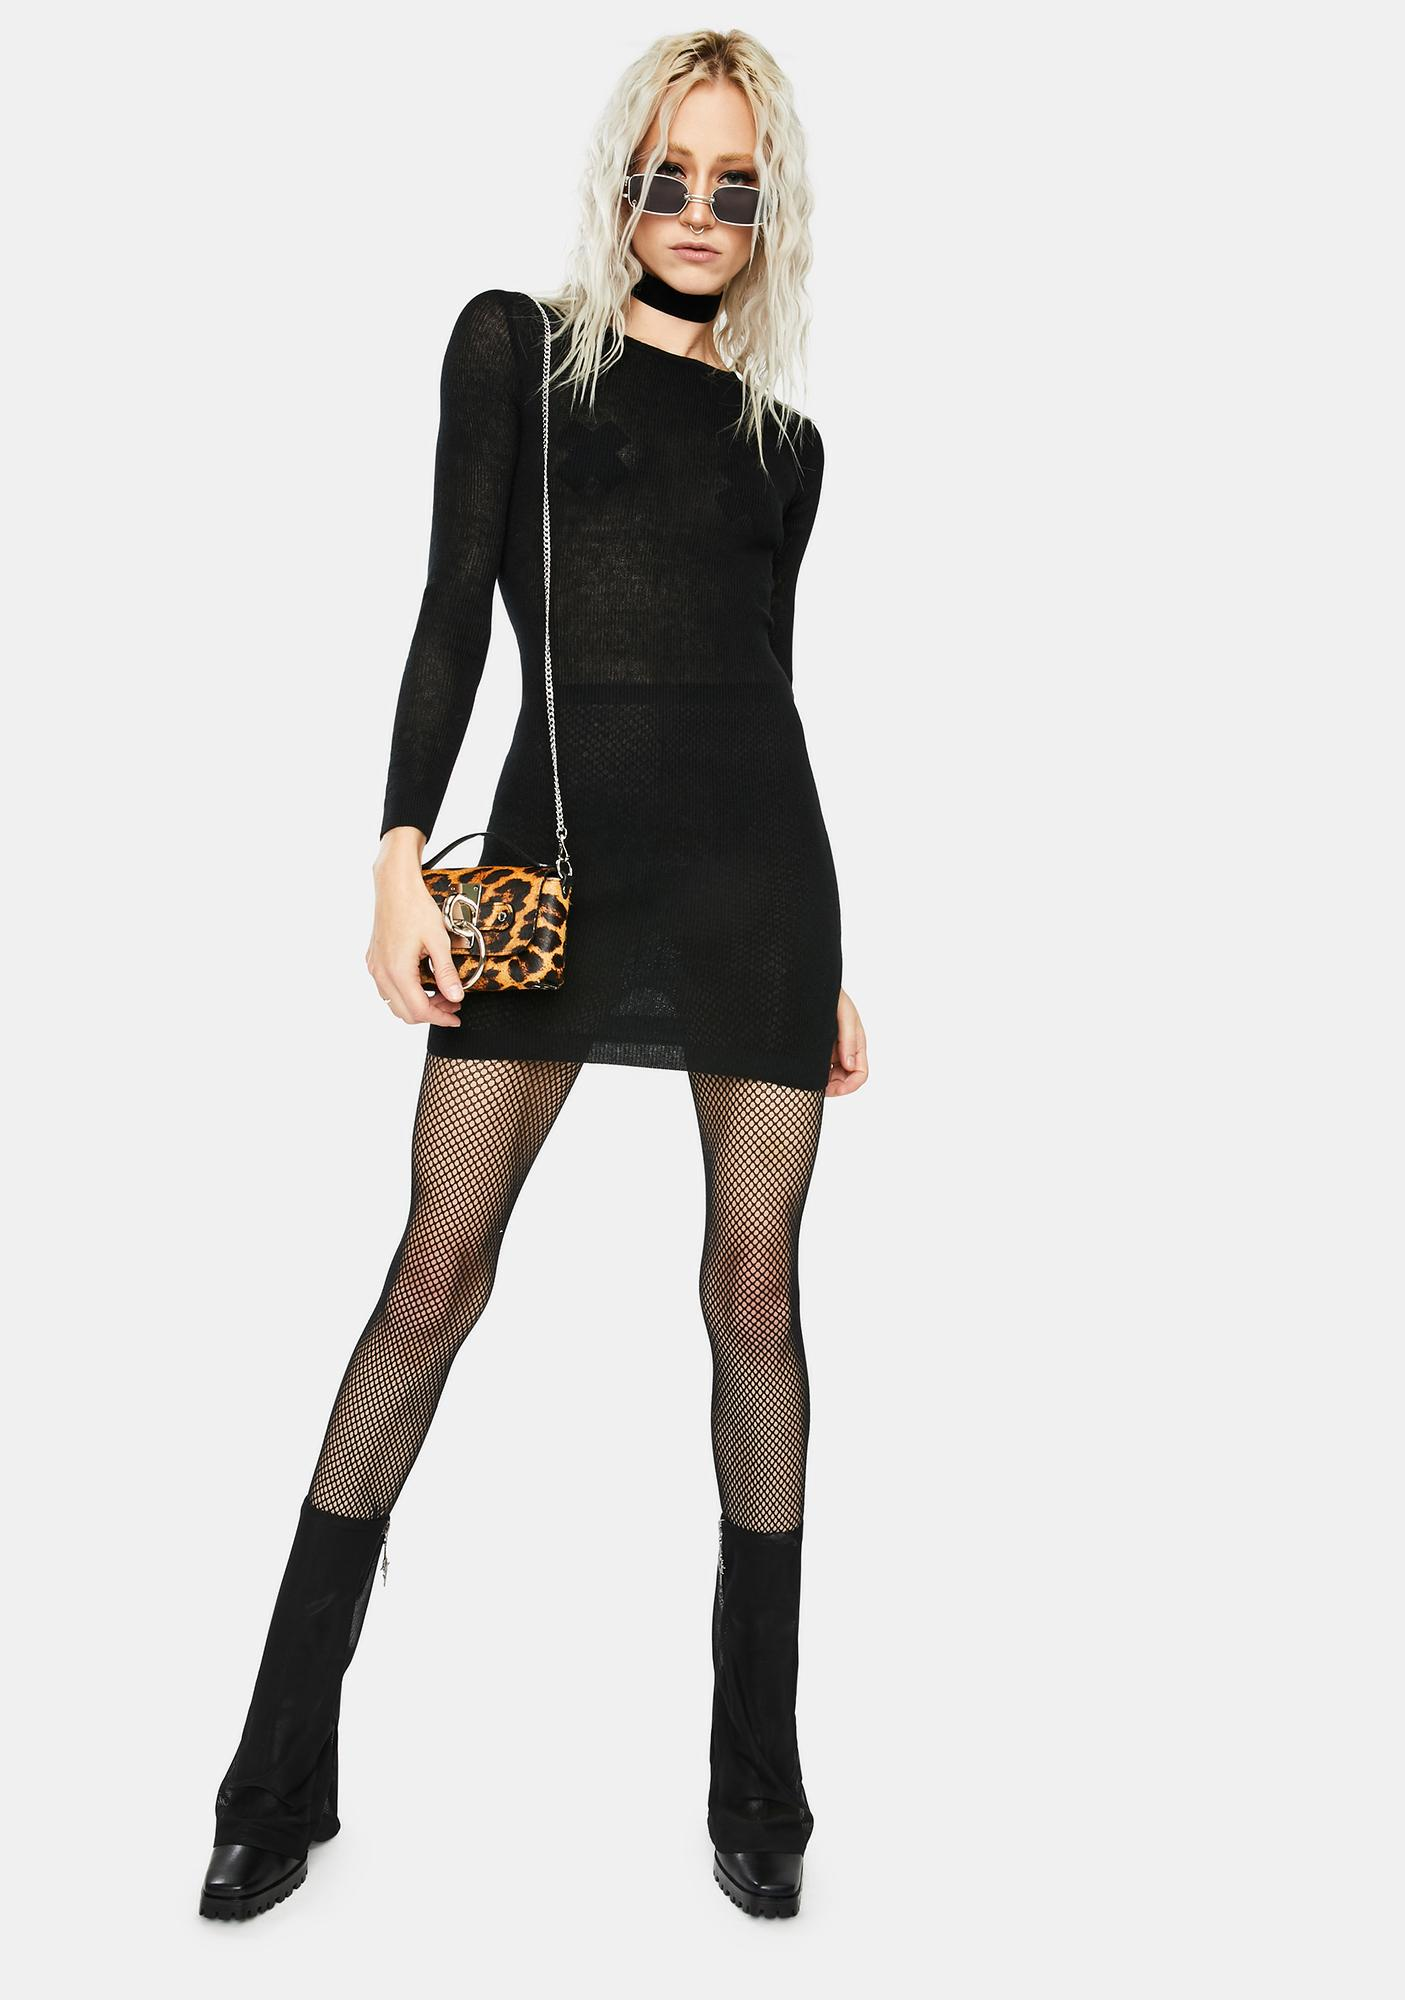 SNDYS. THE LABEL Black Dharma Knit Dress